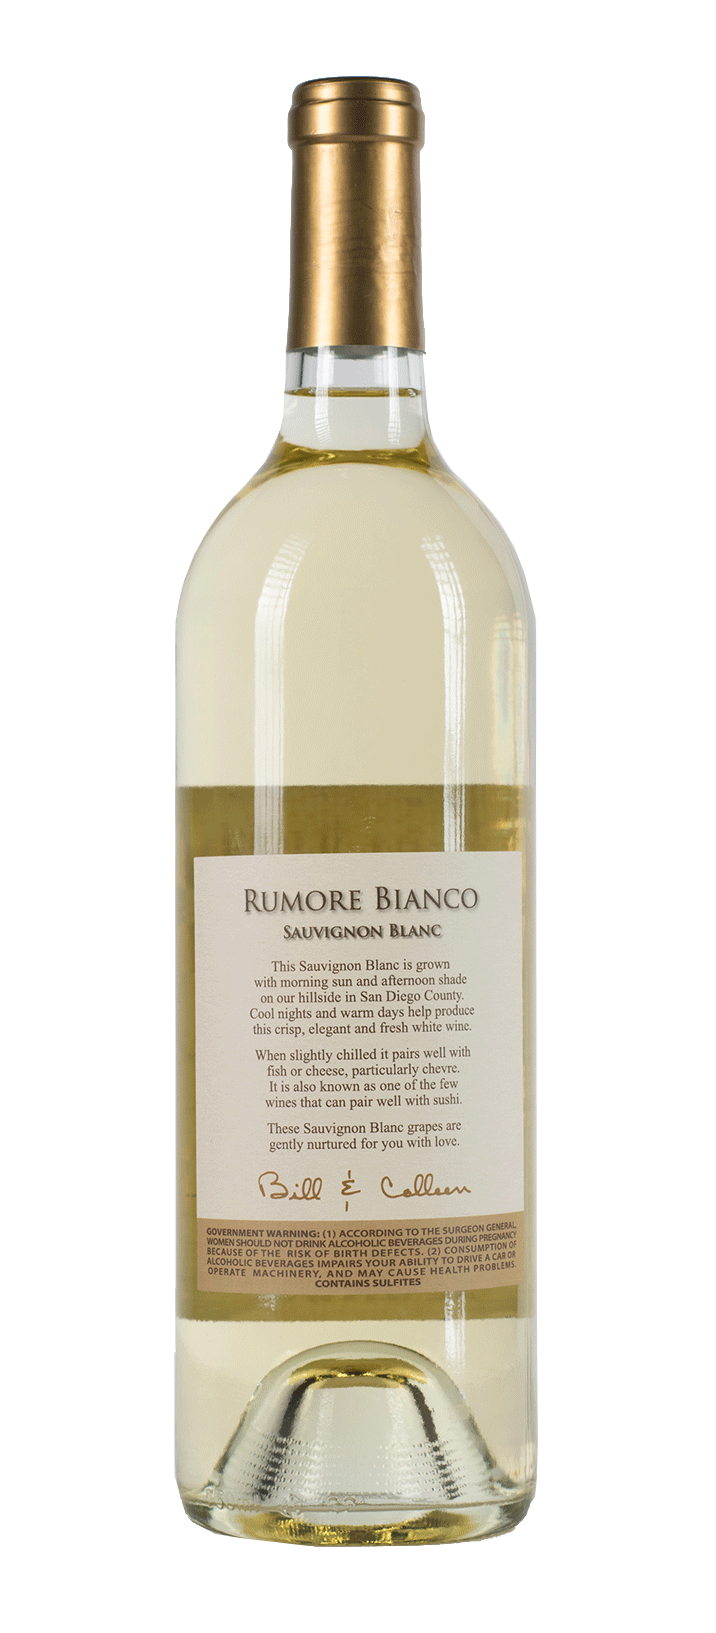 Rumore-Bianco-back.png